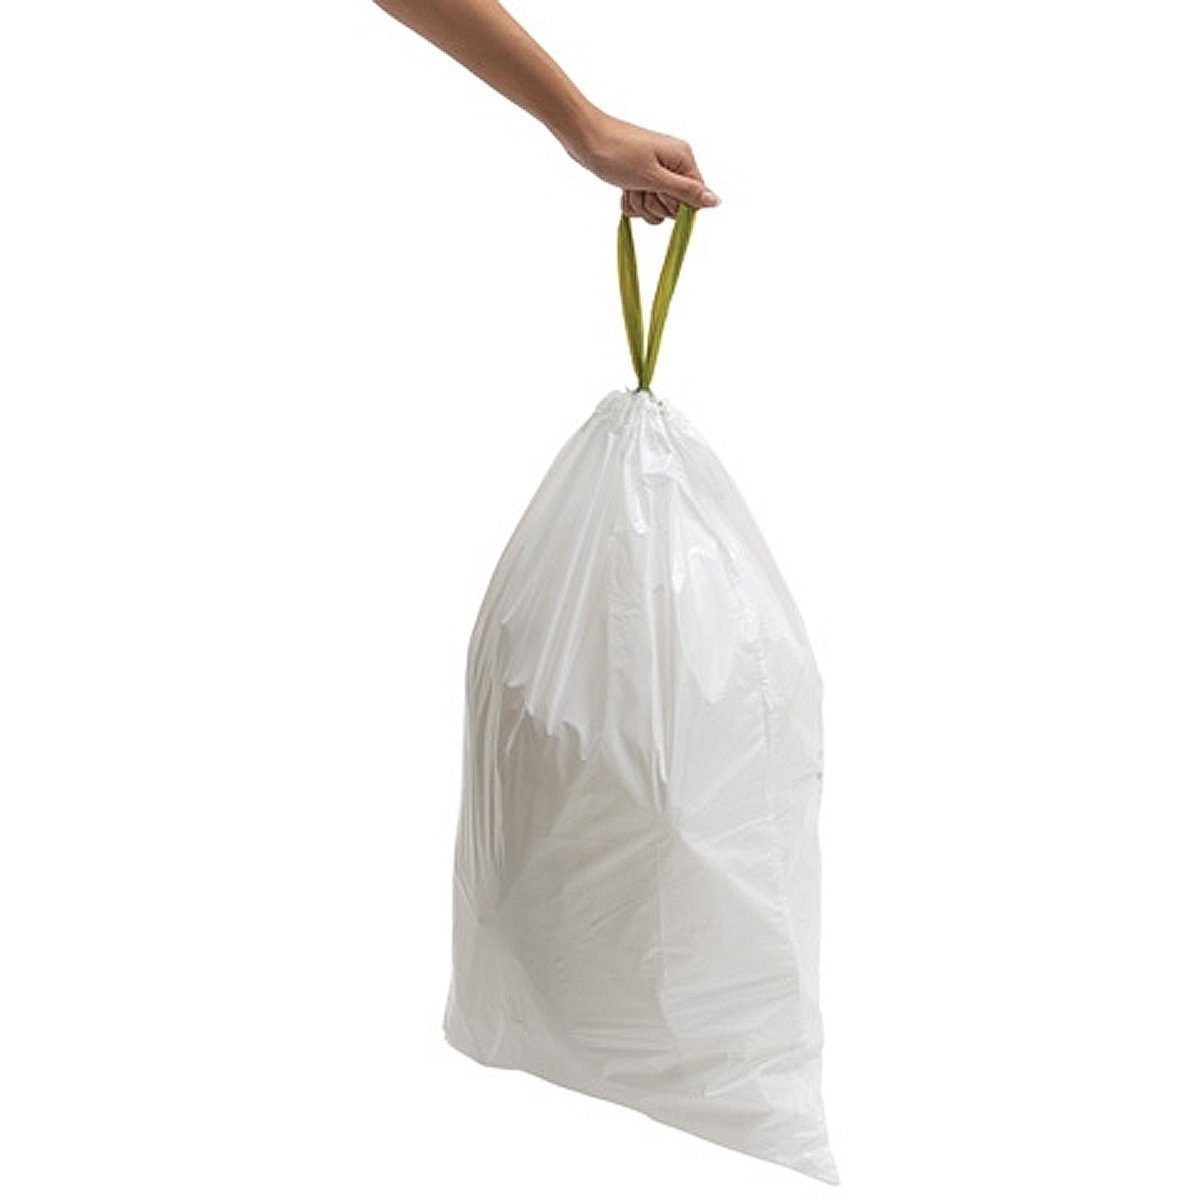 Simplehuman simplehuman 30 Abfallbeutel Müllbeutel A 4.5 l